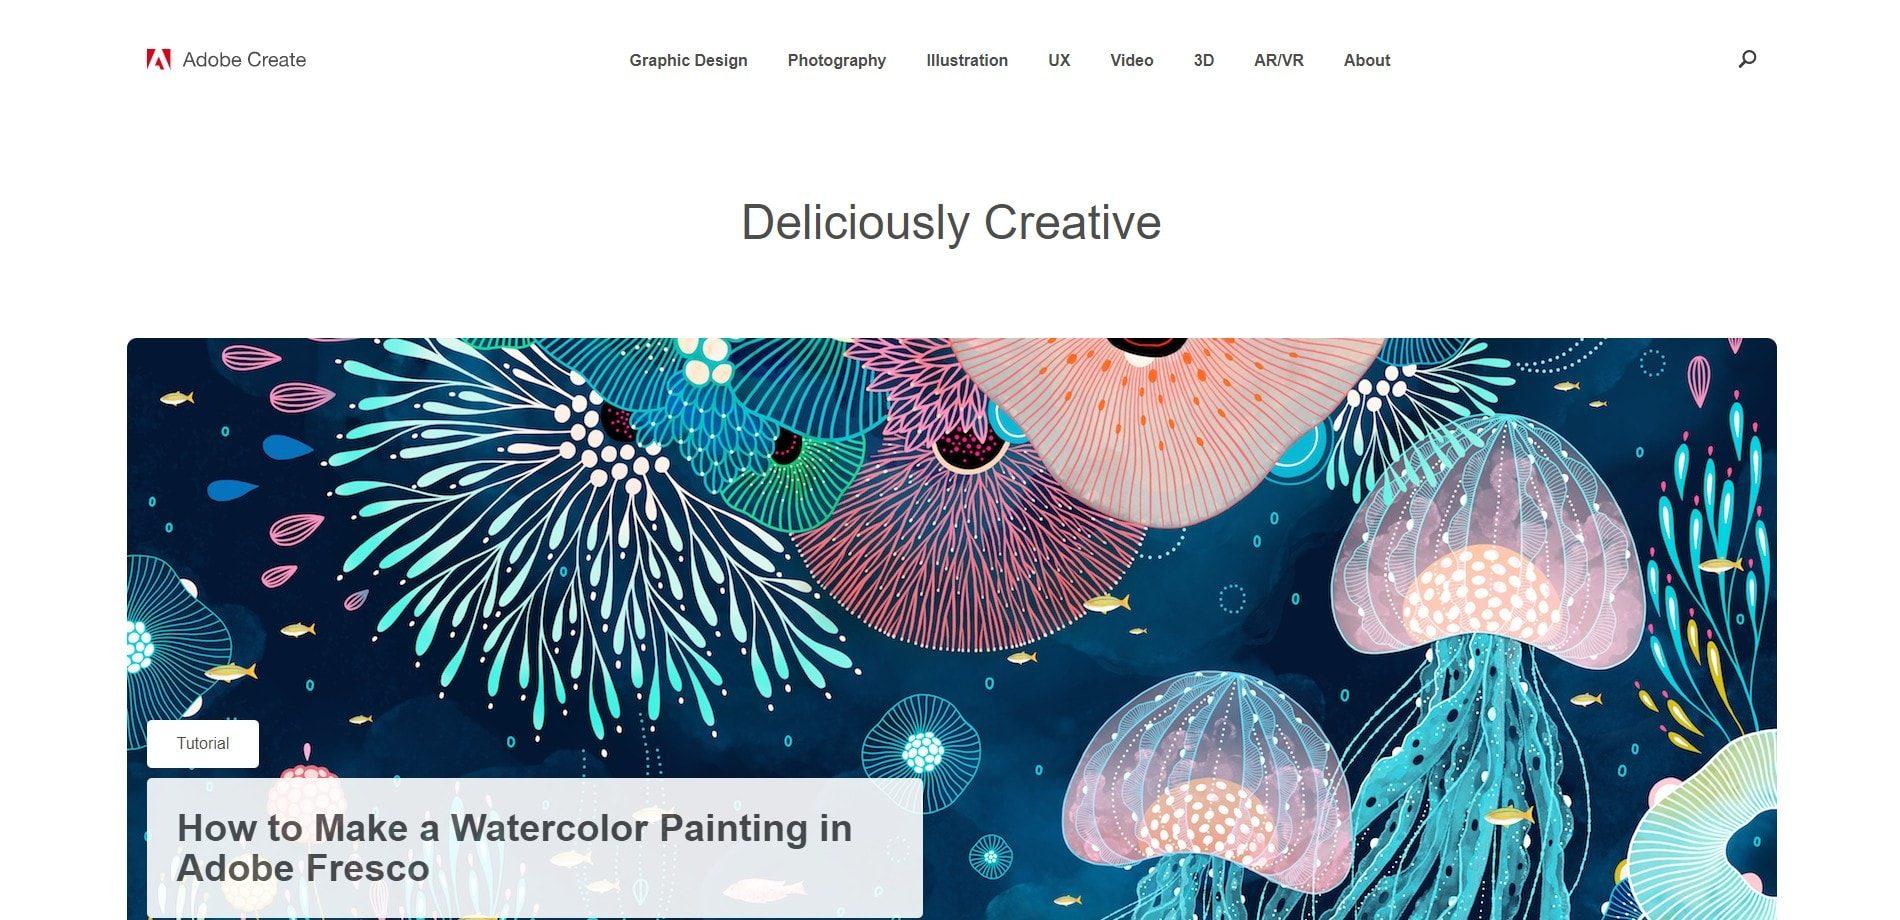 Adobe Create Magazine - Design blog